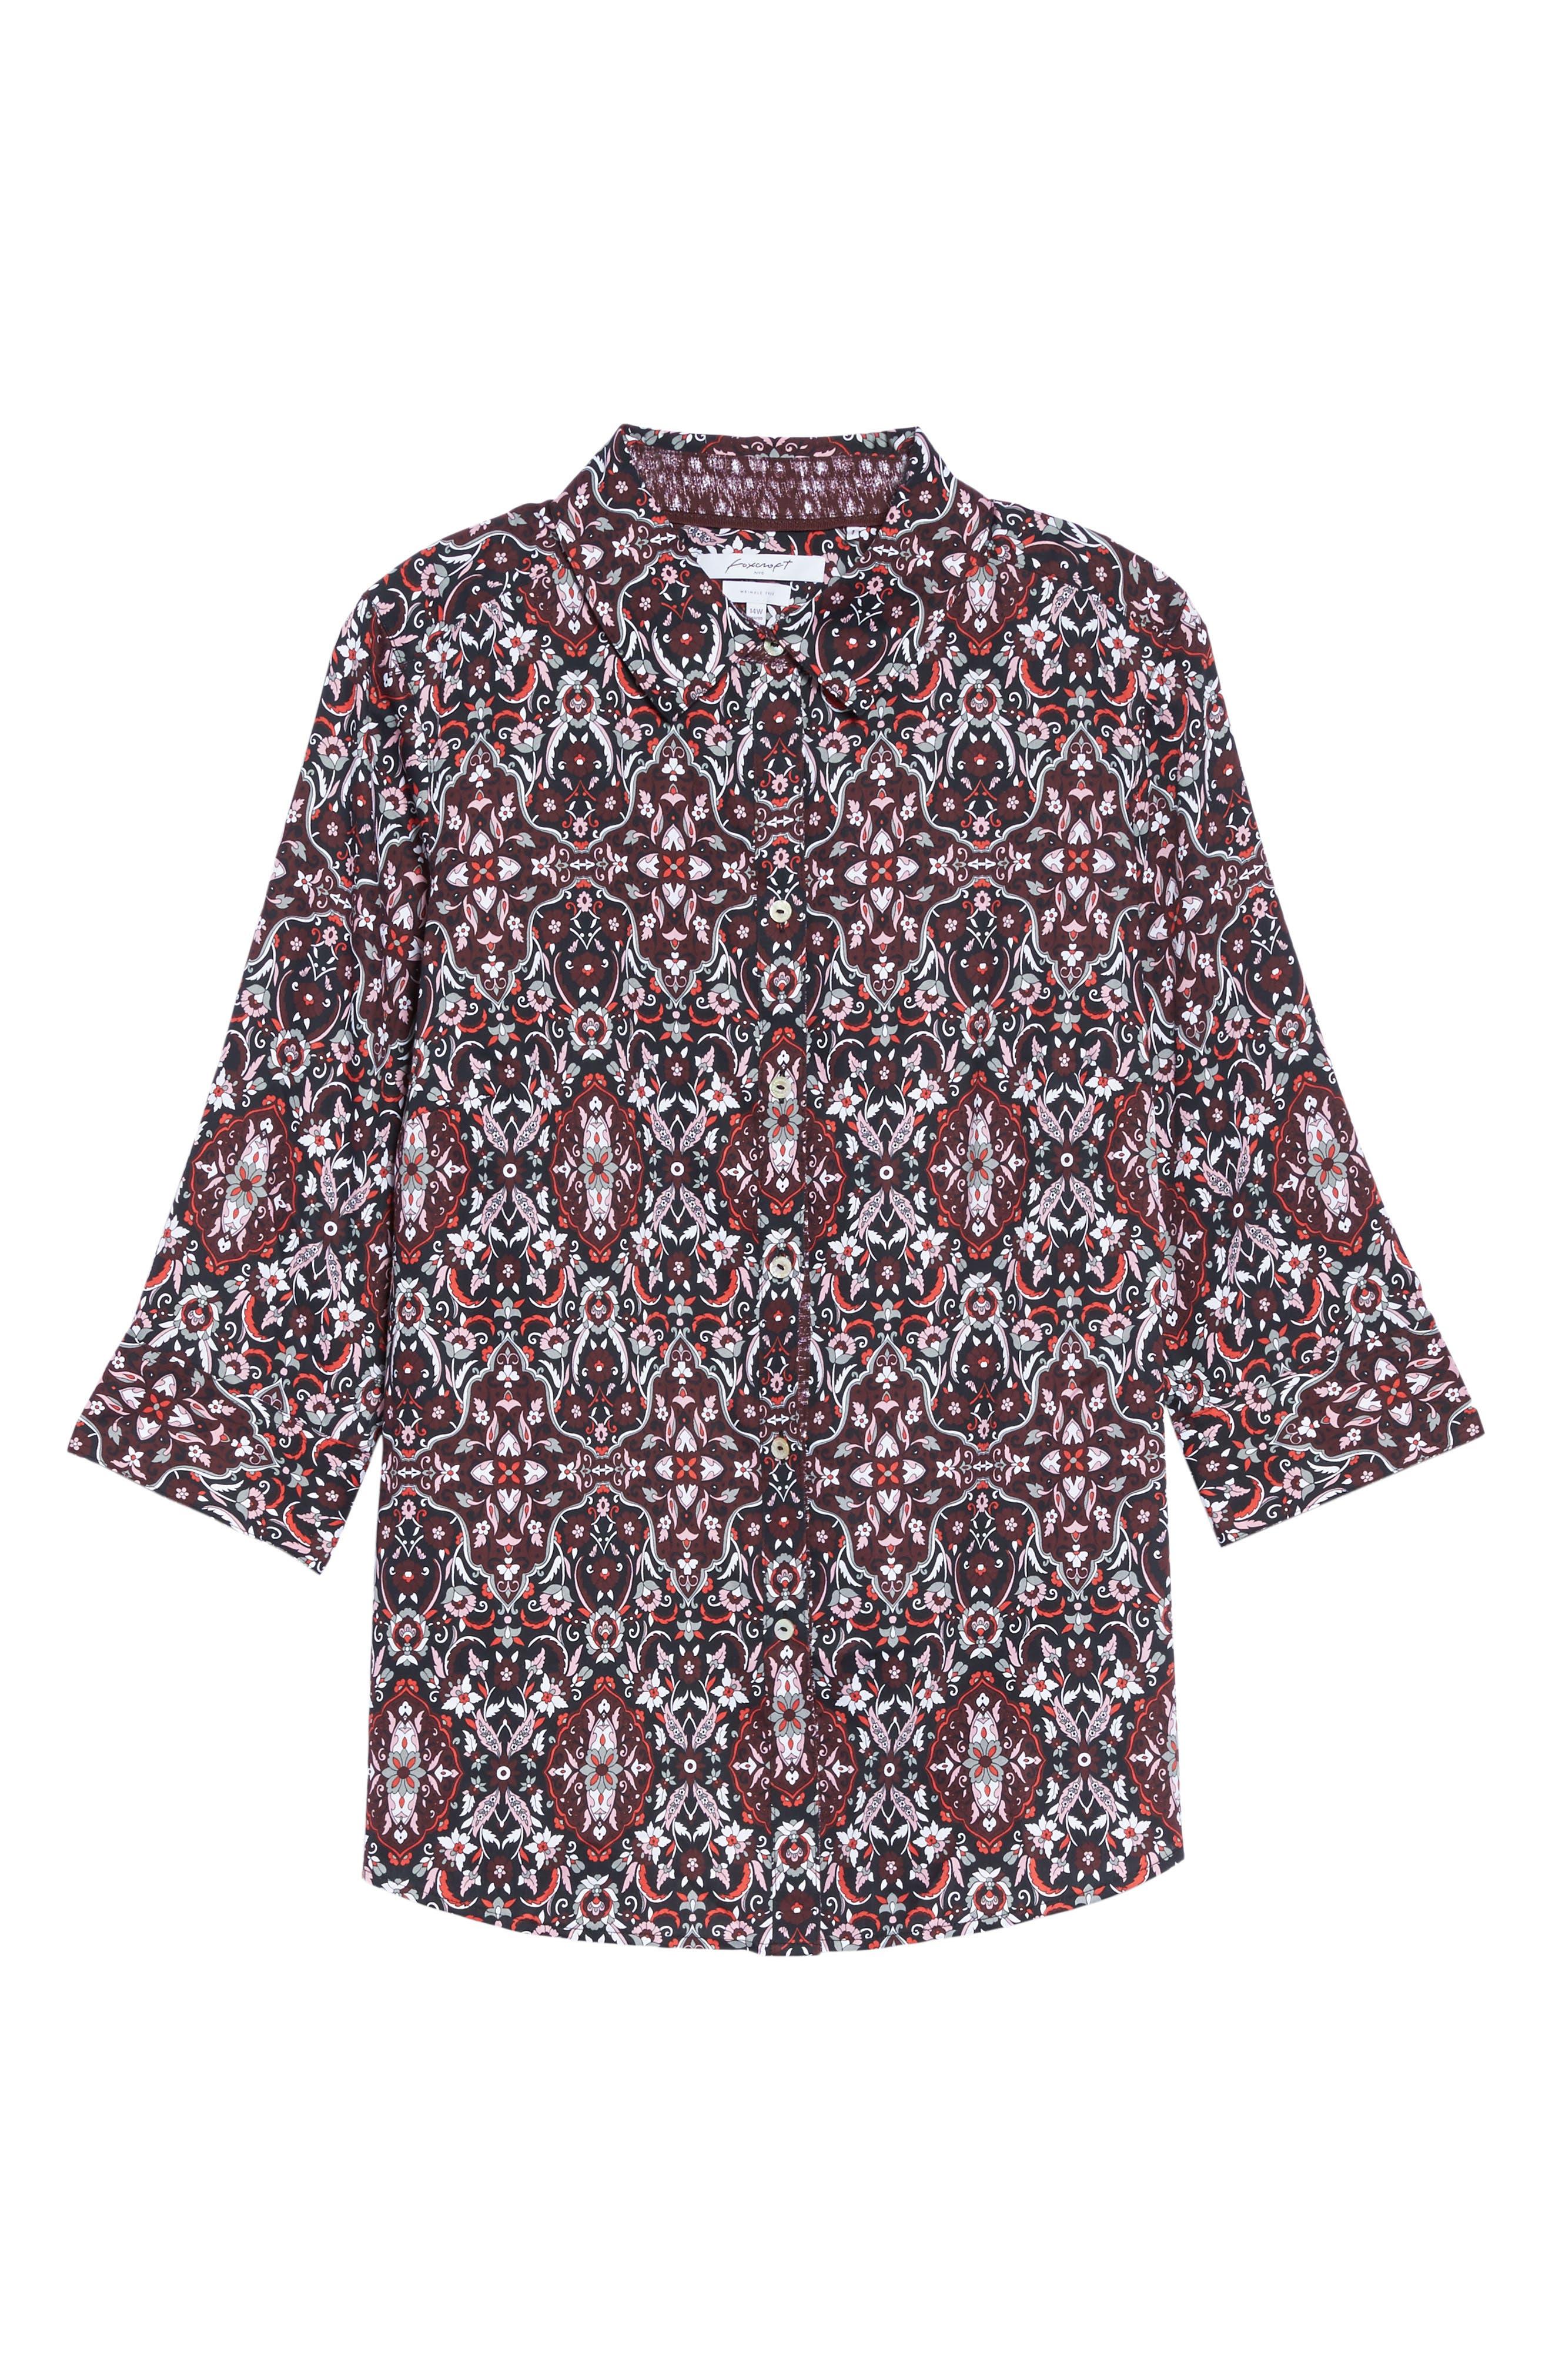 Ava Heirloom Paisley Print Cotton Shirt,                             Alternate thumbnail 6, color,                             602